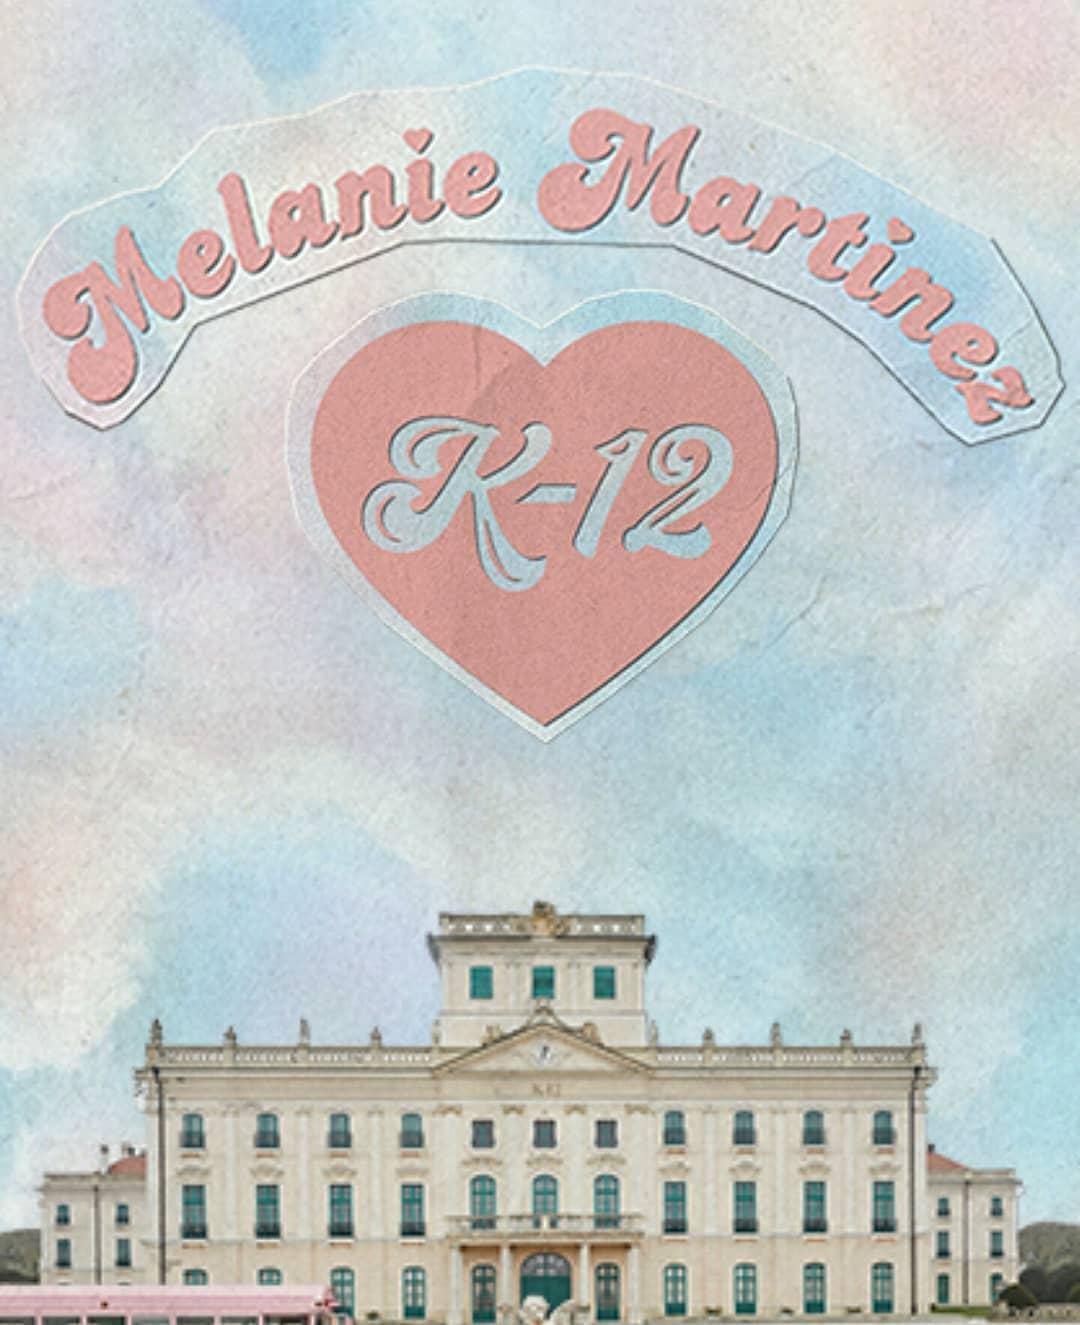 Melanie Martinez Aesthetic K-12 Wallpapers - Wallpaper Cave